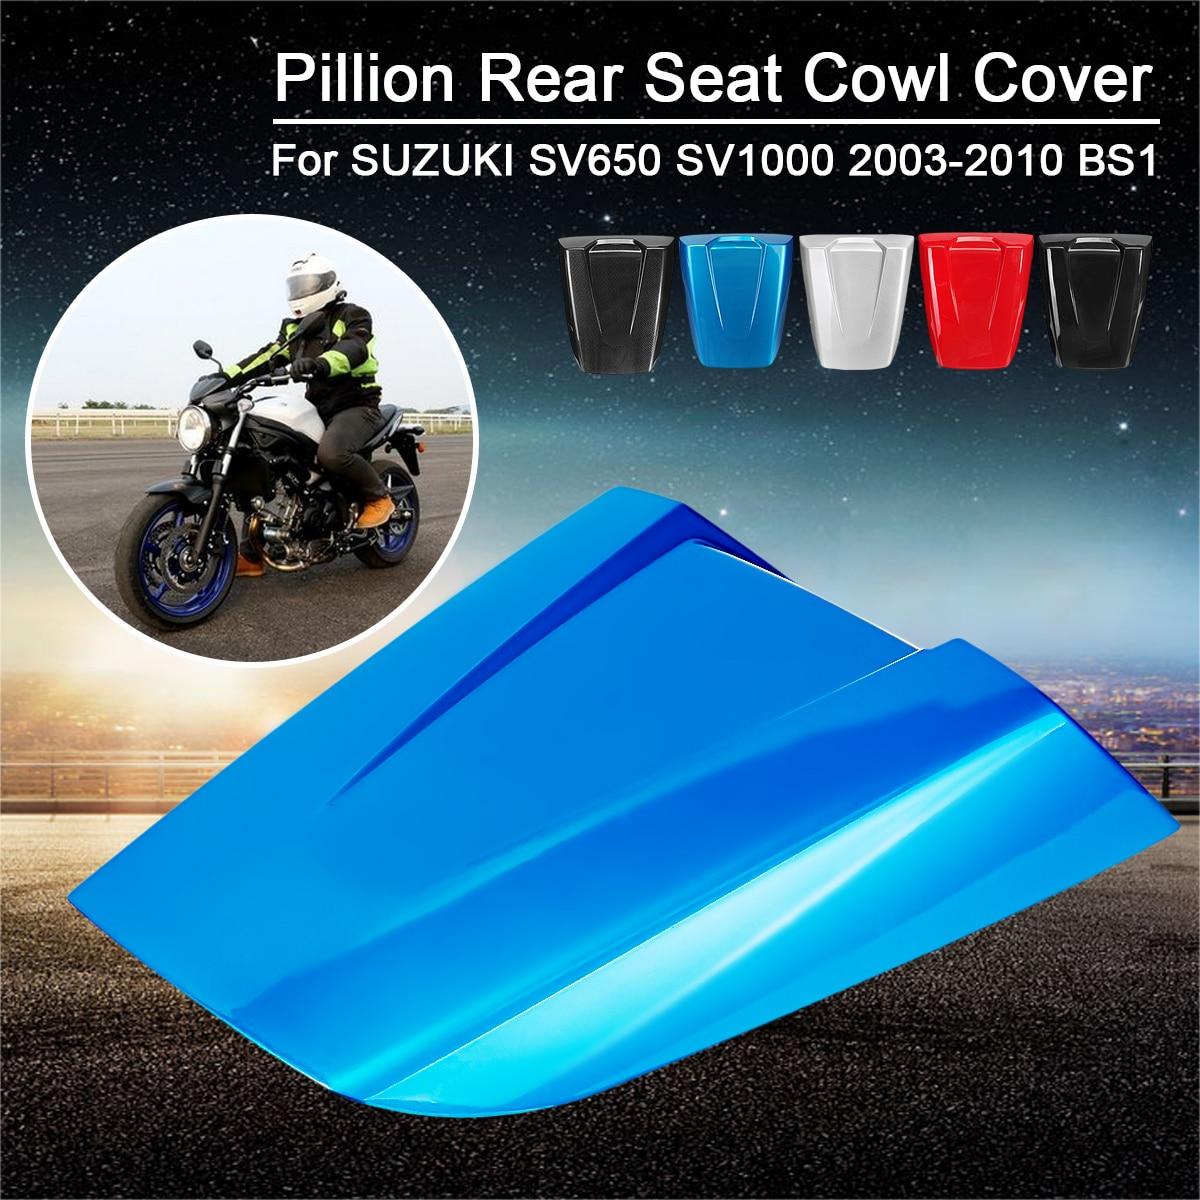 Motorcycle Fairing Set Passenger Rear Pillion Passenger Seat Cover Cowl Tail Fairing 5Color for SUZUKI SV650 SV1000 2003 2010